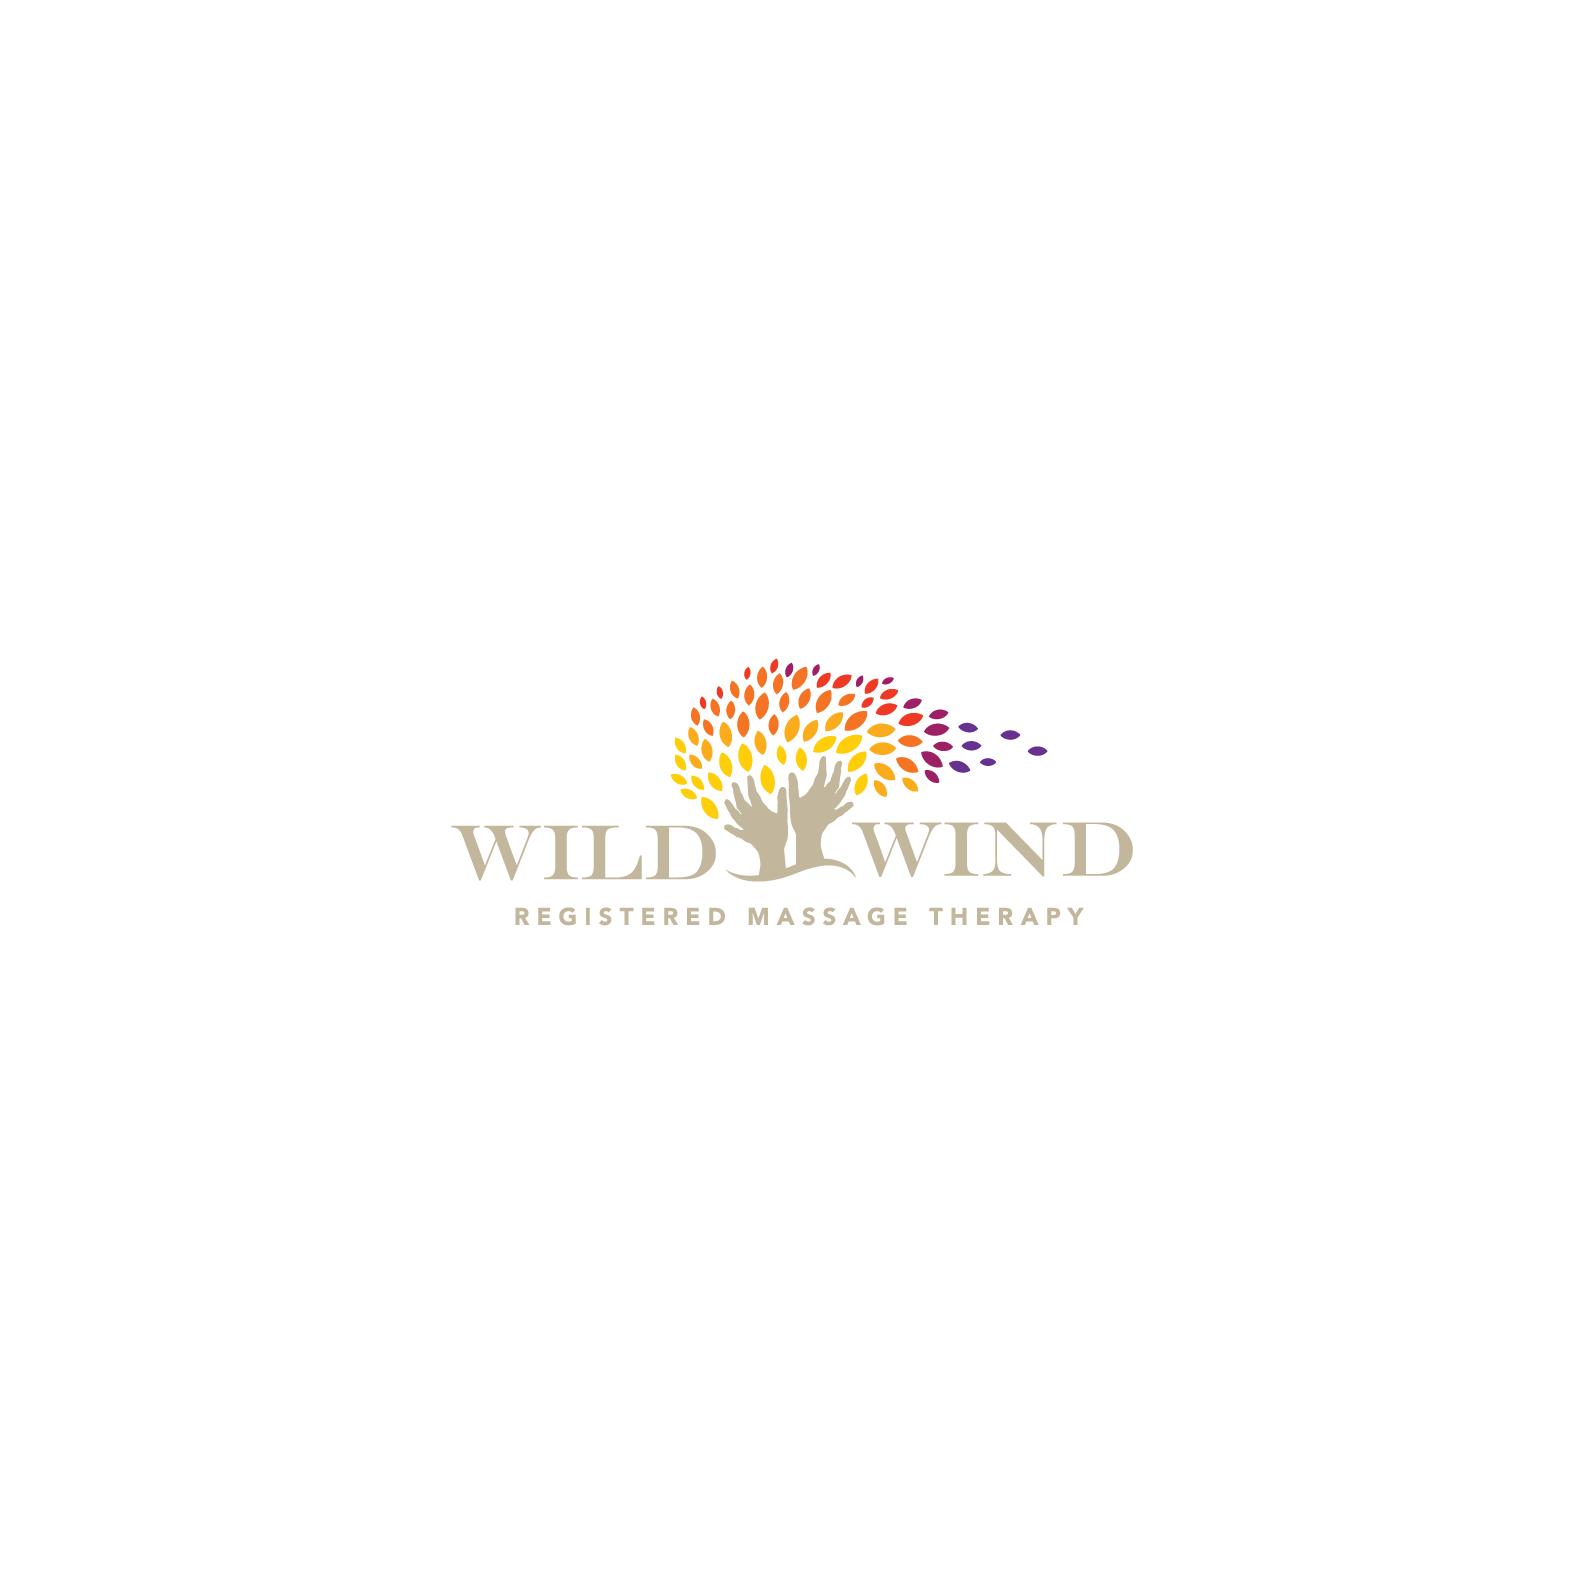 Logo_WildWindpng